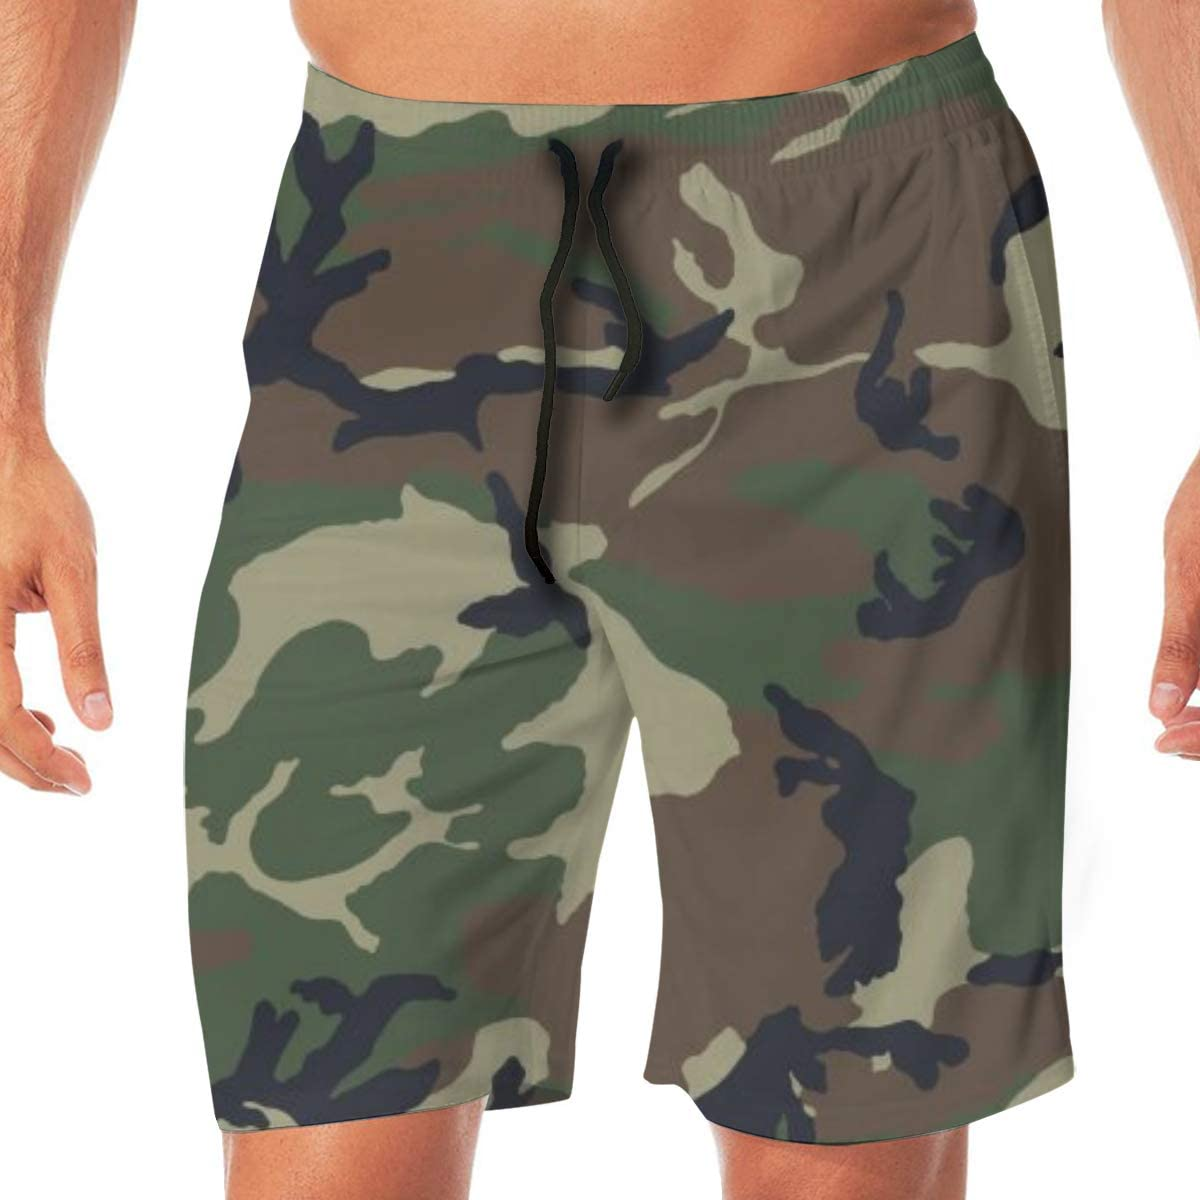 GARDE ART STUDIO Men Casual Beach Shorts Swim Trunks Quick Dry Half Pants